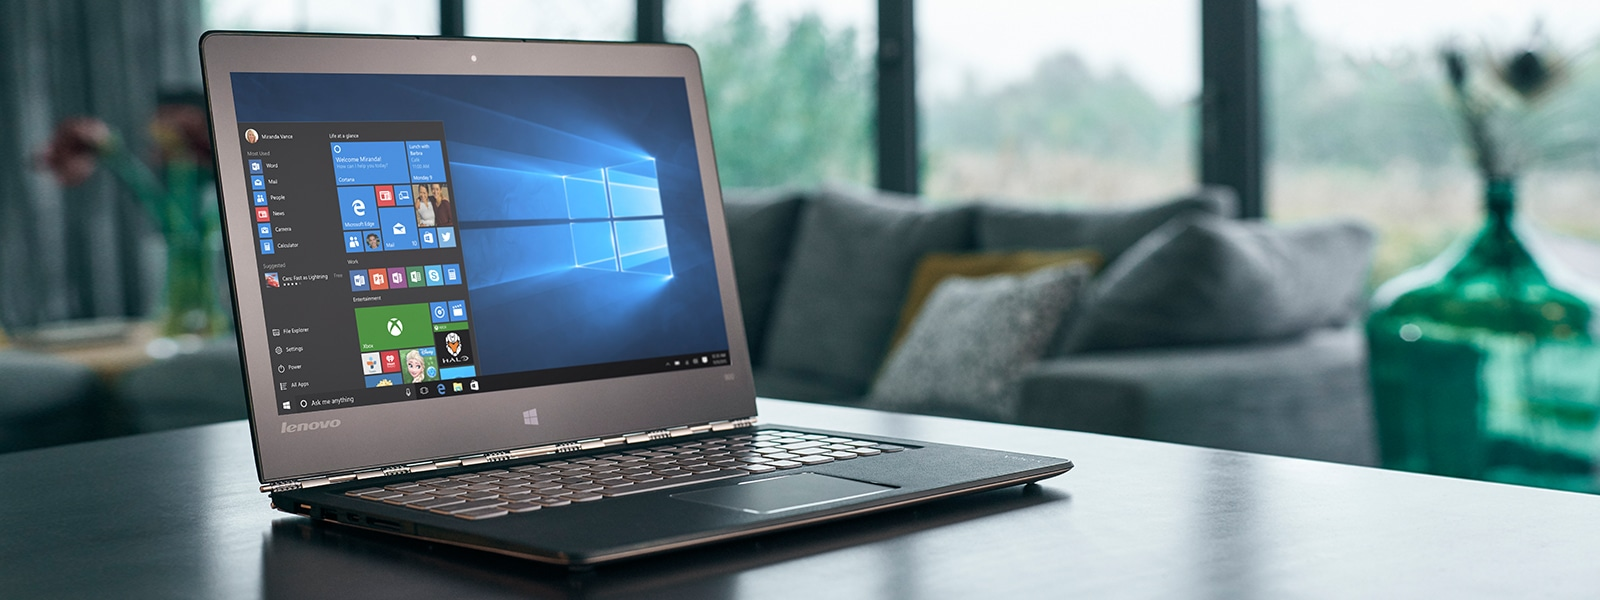 ПК с Windows 10